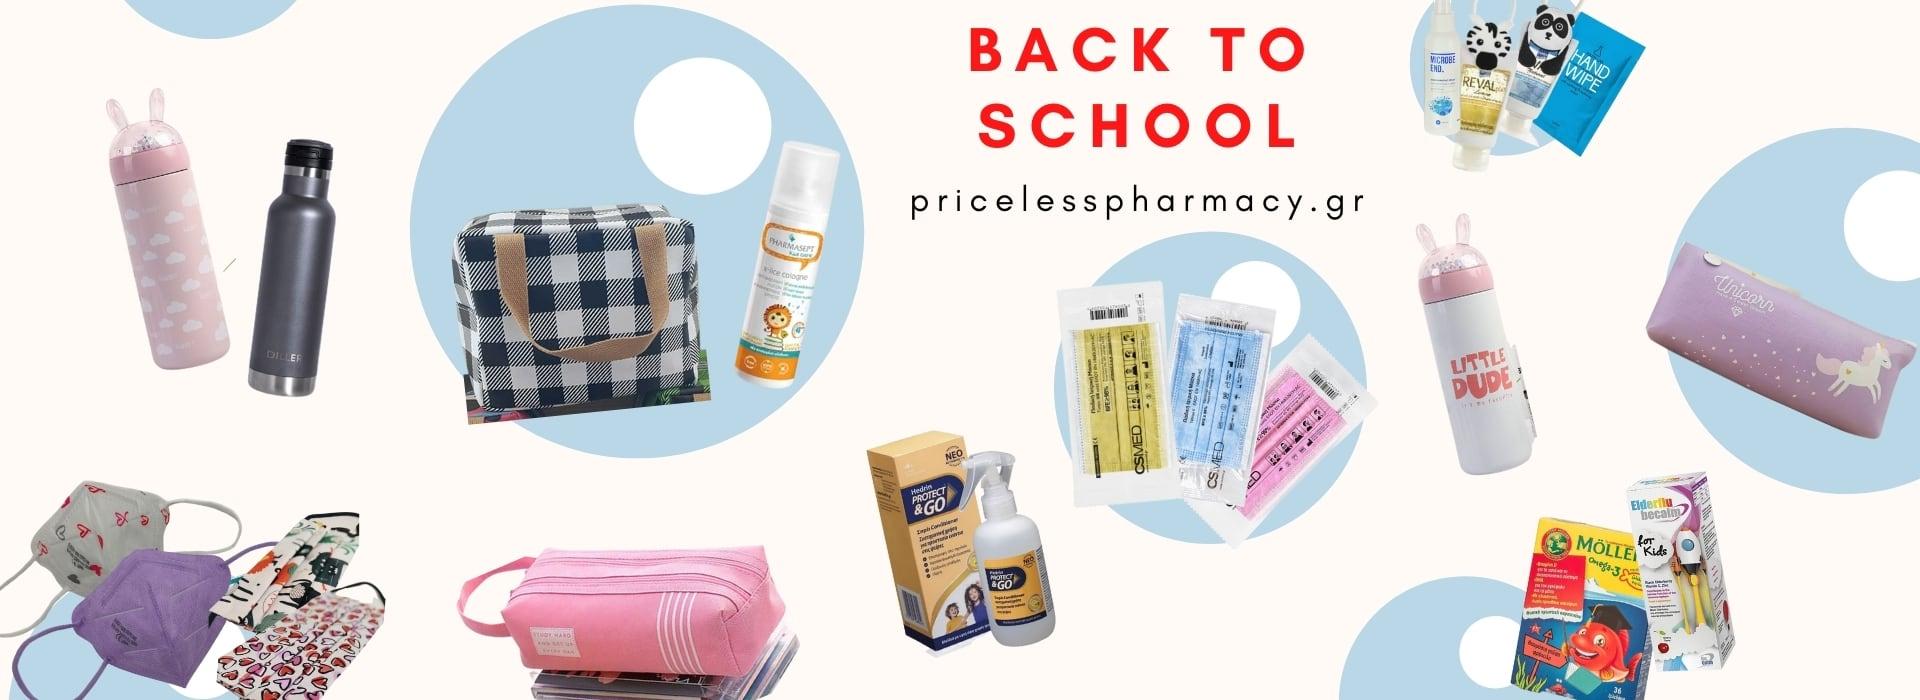 back-to-school-pricelesspharmacy